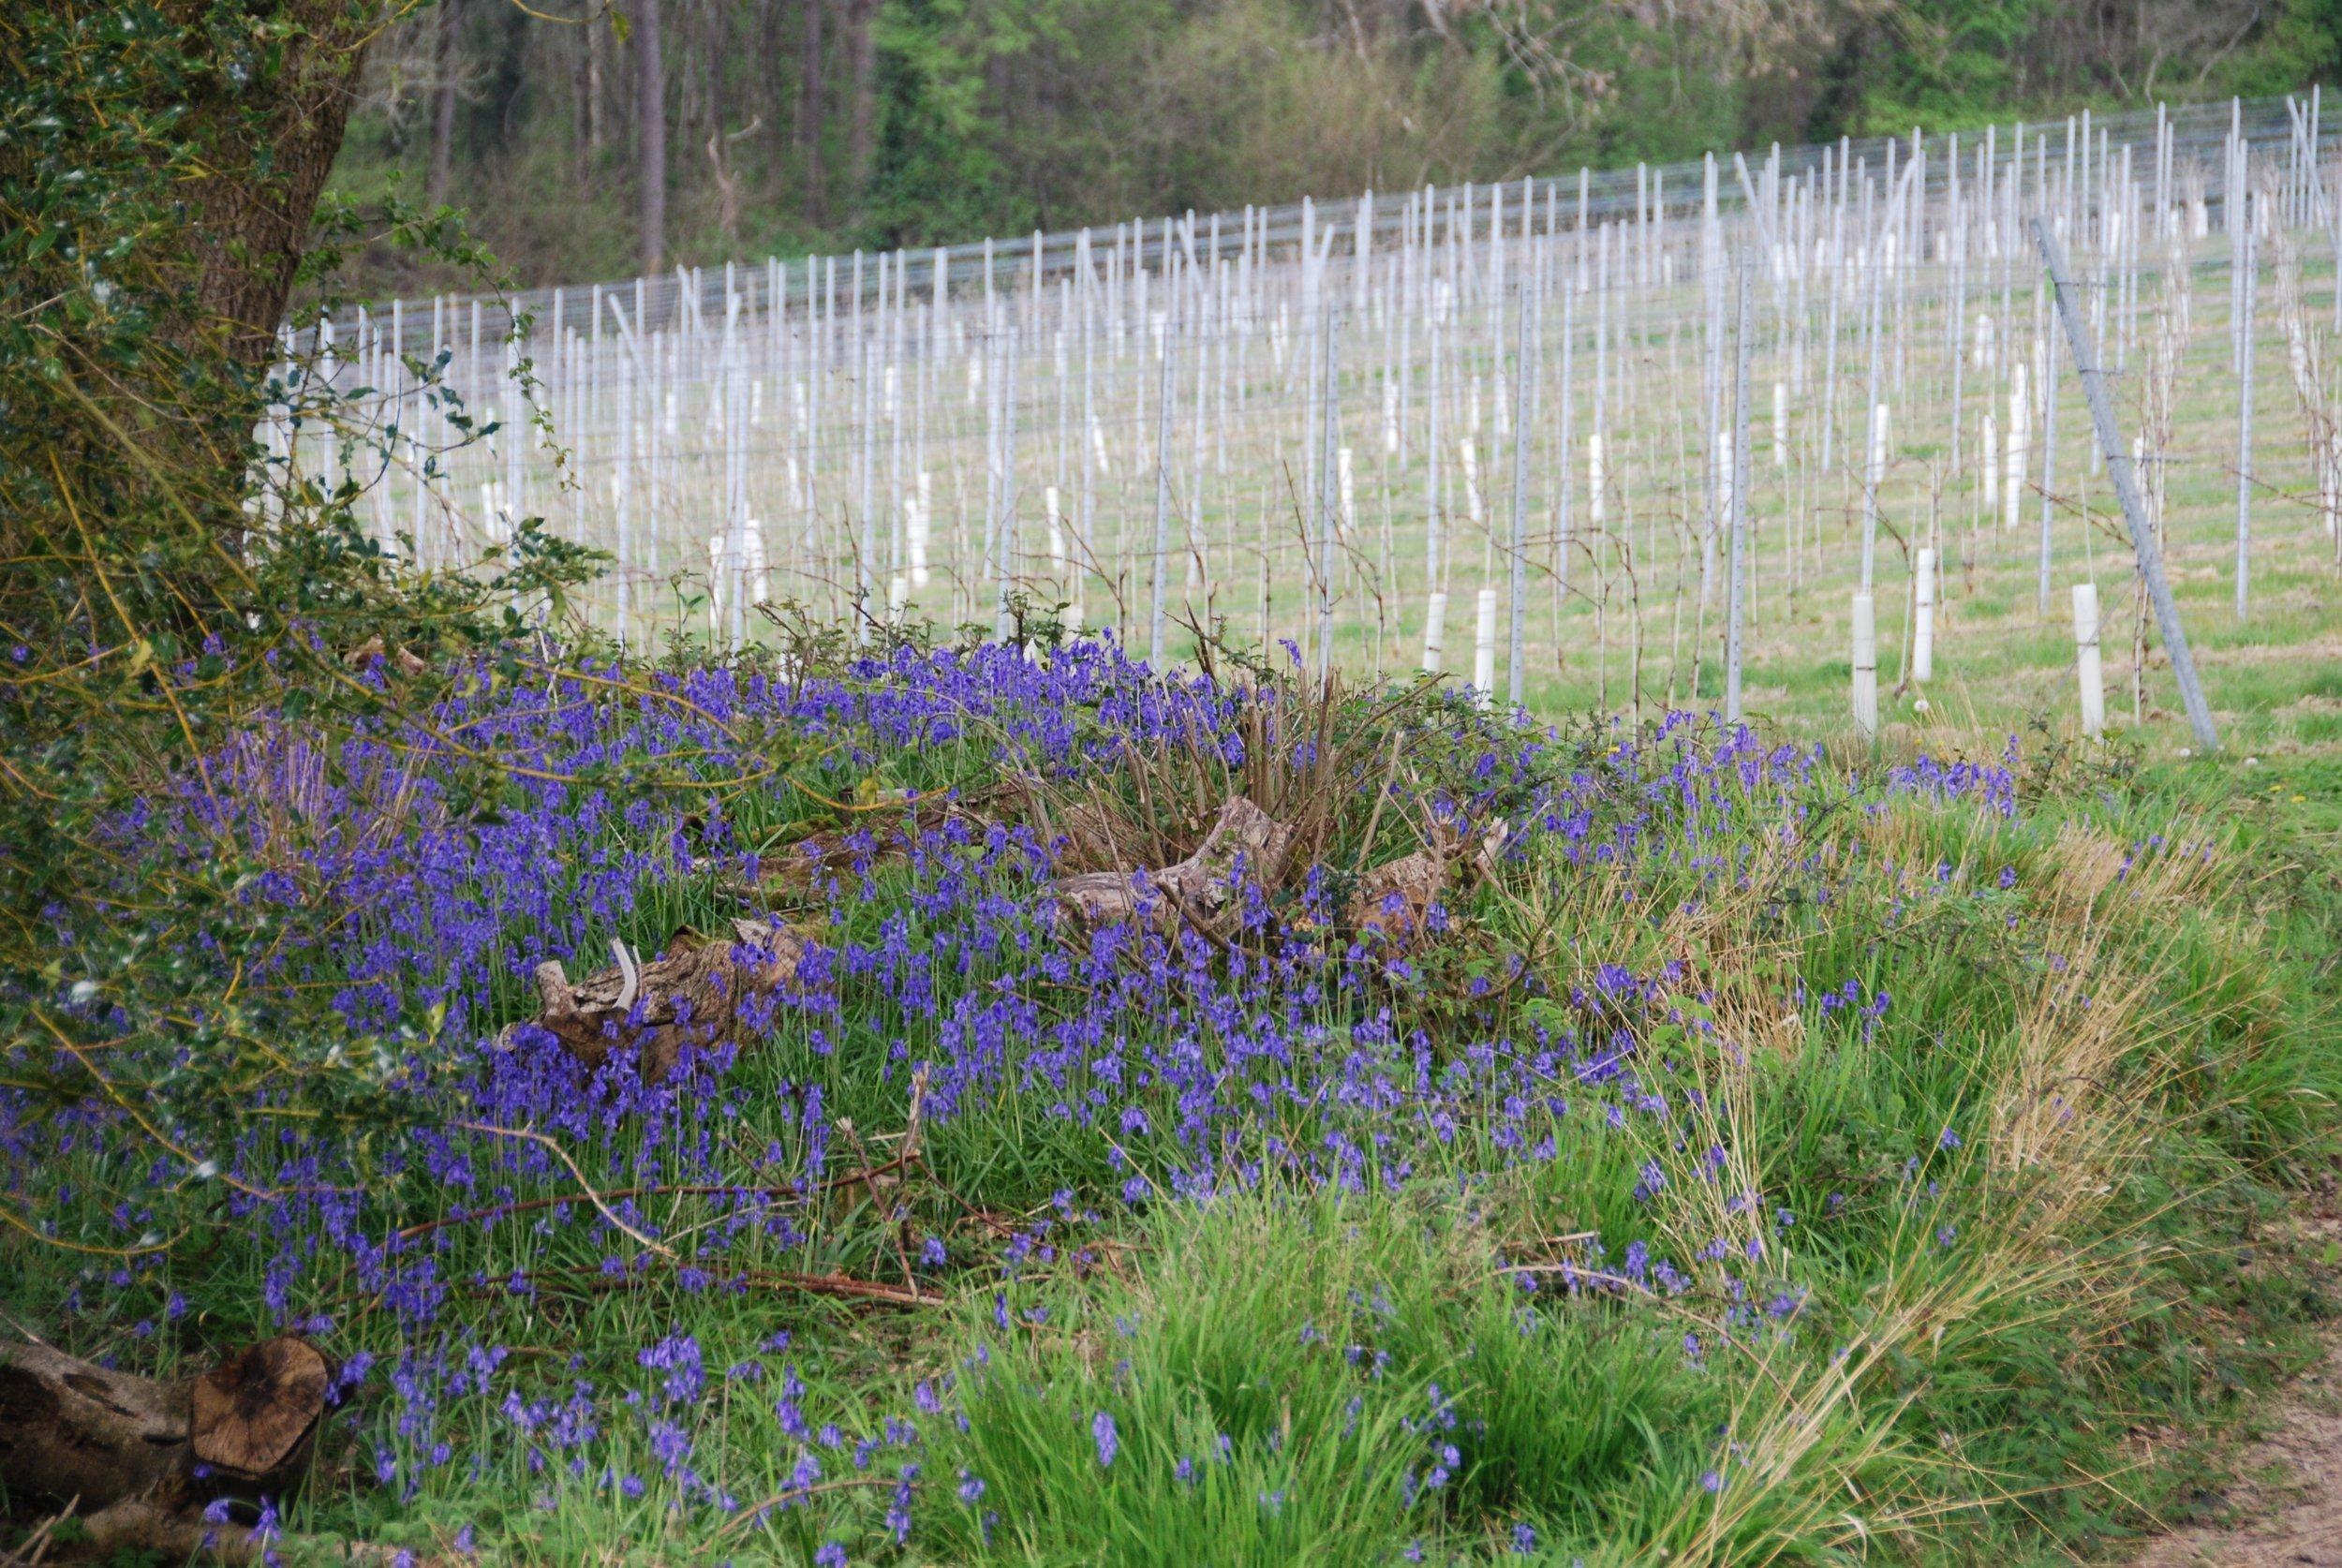 Classic Spring bluebells!